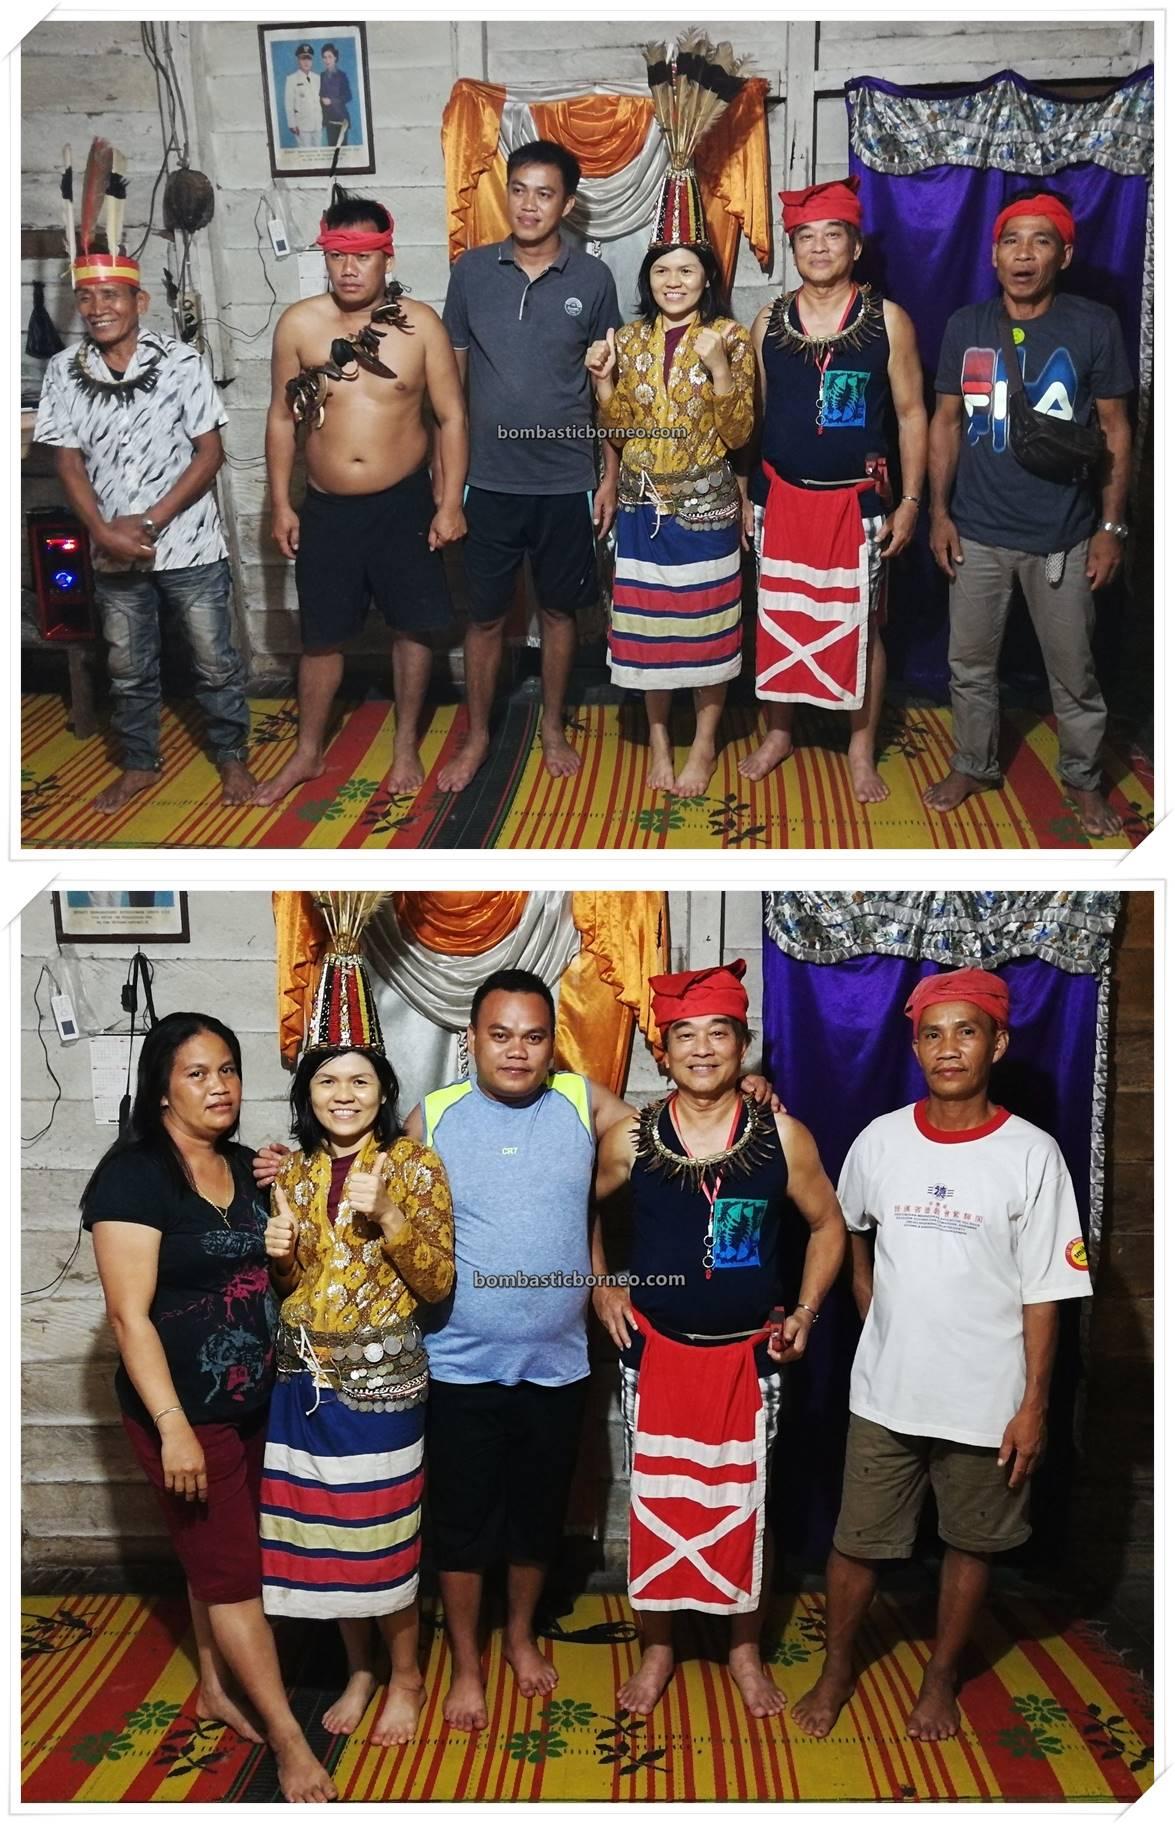 Gawai Nyobeng, Dusun Kambih, village, indigenous, event, Indonesia, Bengkayang, Seluas, native, tribal, Tourism, Trans Border, Borneo, 婆罗洲西加里曼丹, 孟加映比达友部落, 印尼土著传统文化